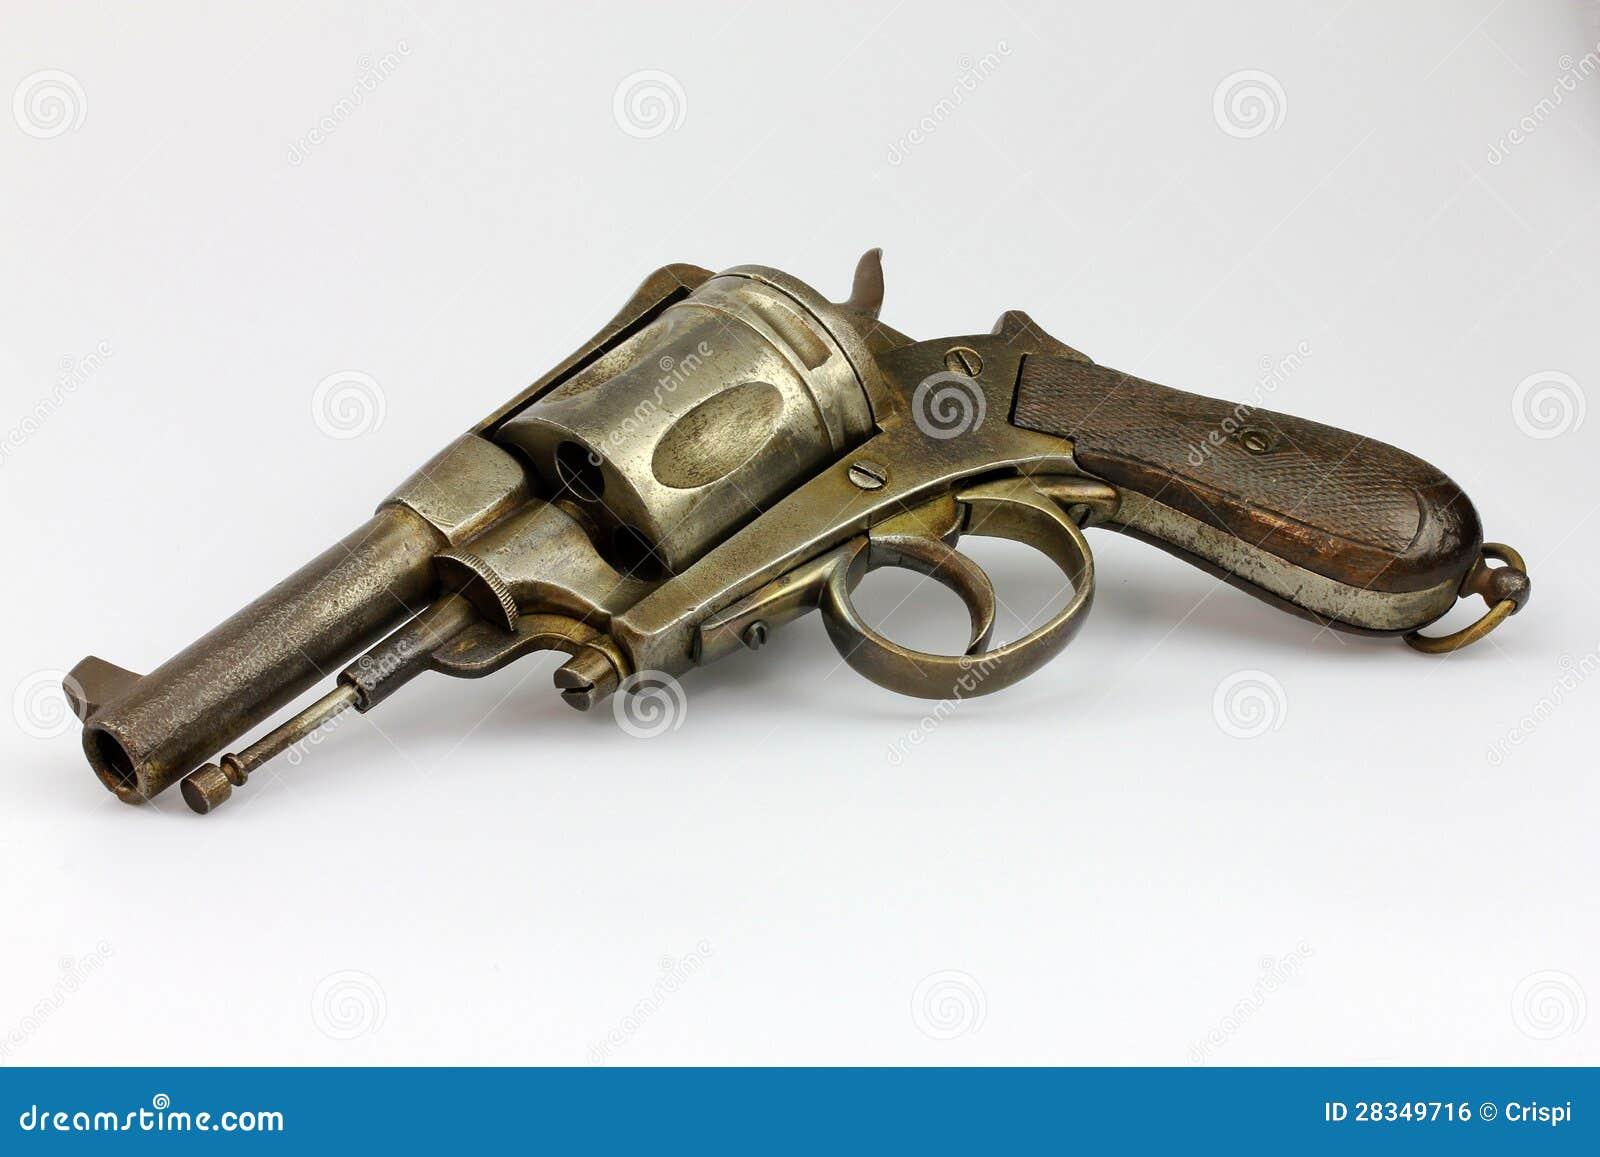 Antique Revolver Royalty Free Stock Image - Image: 28349716